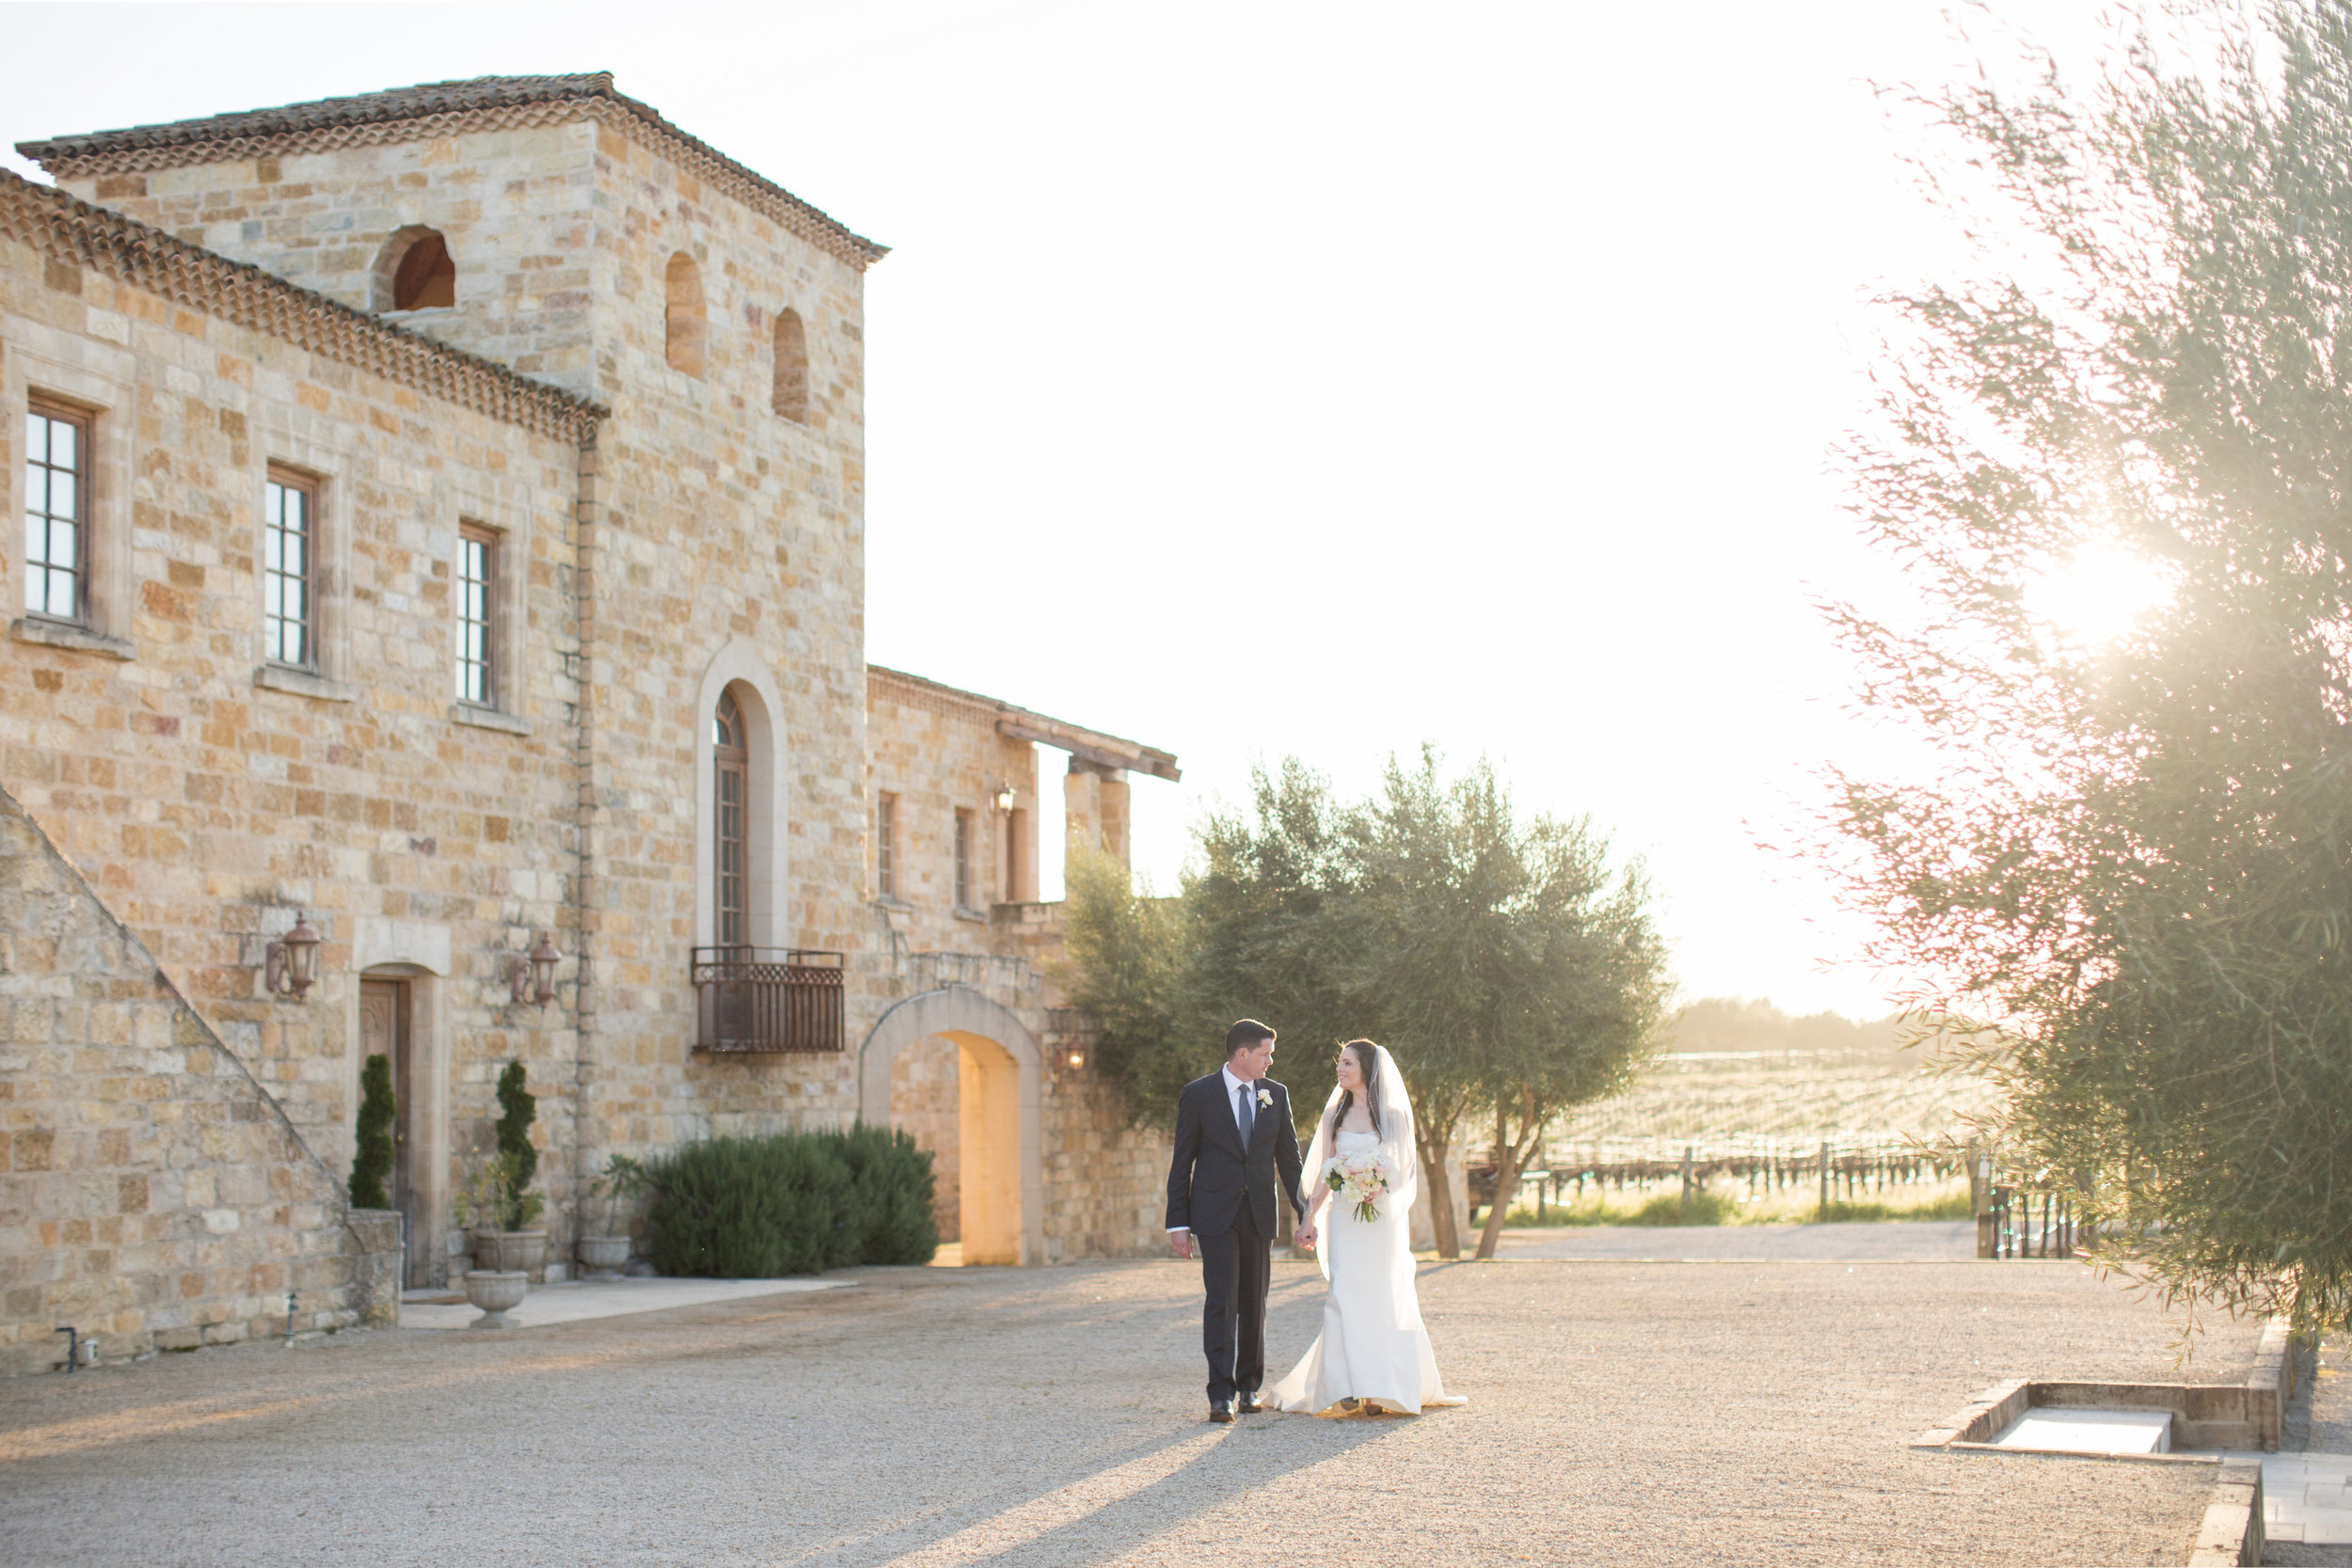 santa-barbara-elopement-wedding-planner-planning-coordinator-event-day-of-sunstone-winery-villa-tuscan-vineyard-gold-classic-elope (9).jpg